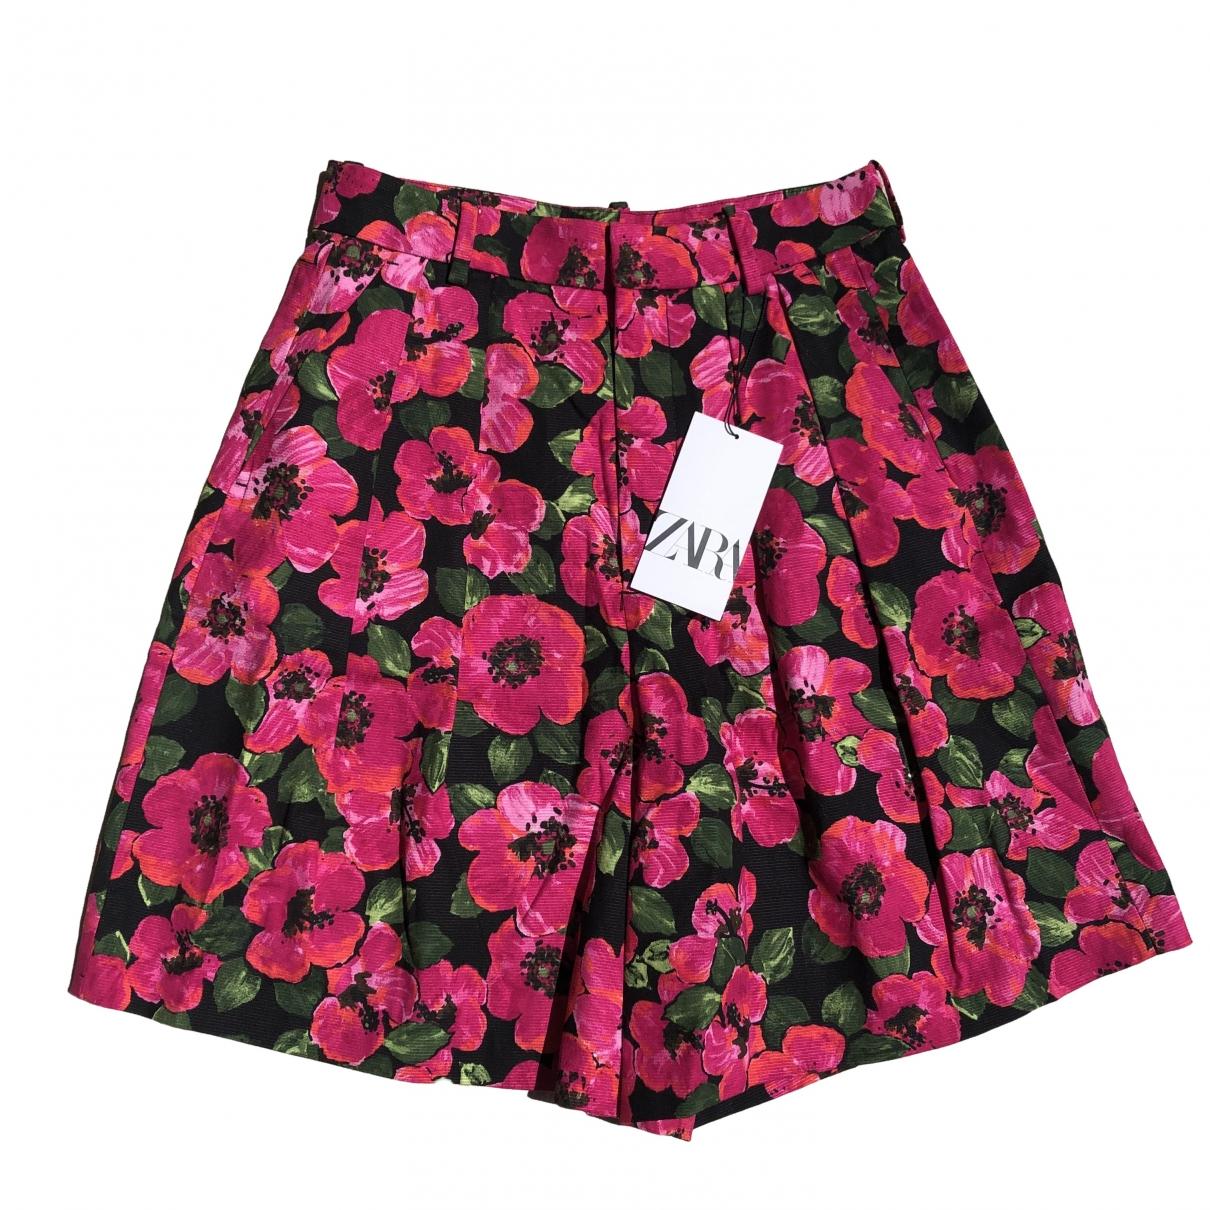 Zara \N Multicolour Shorts for Women XS International